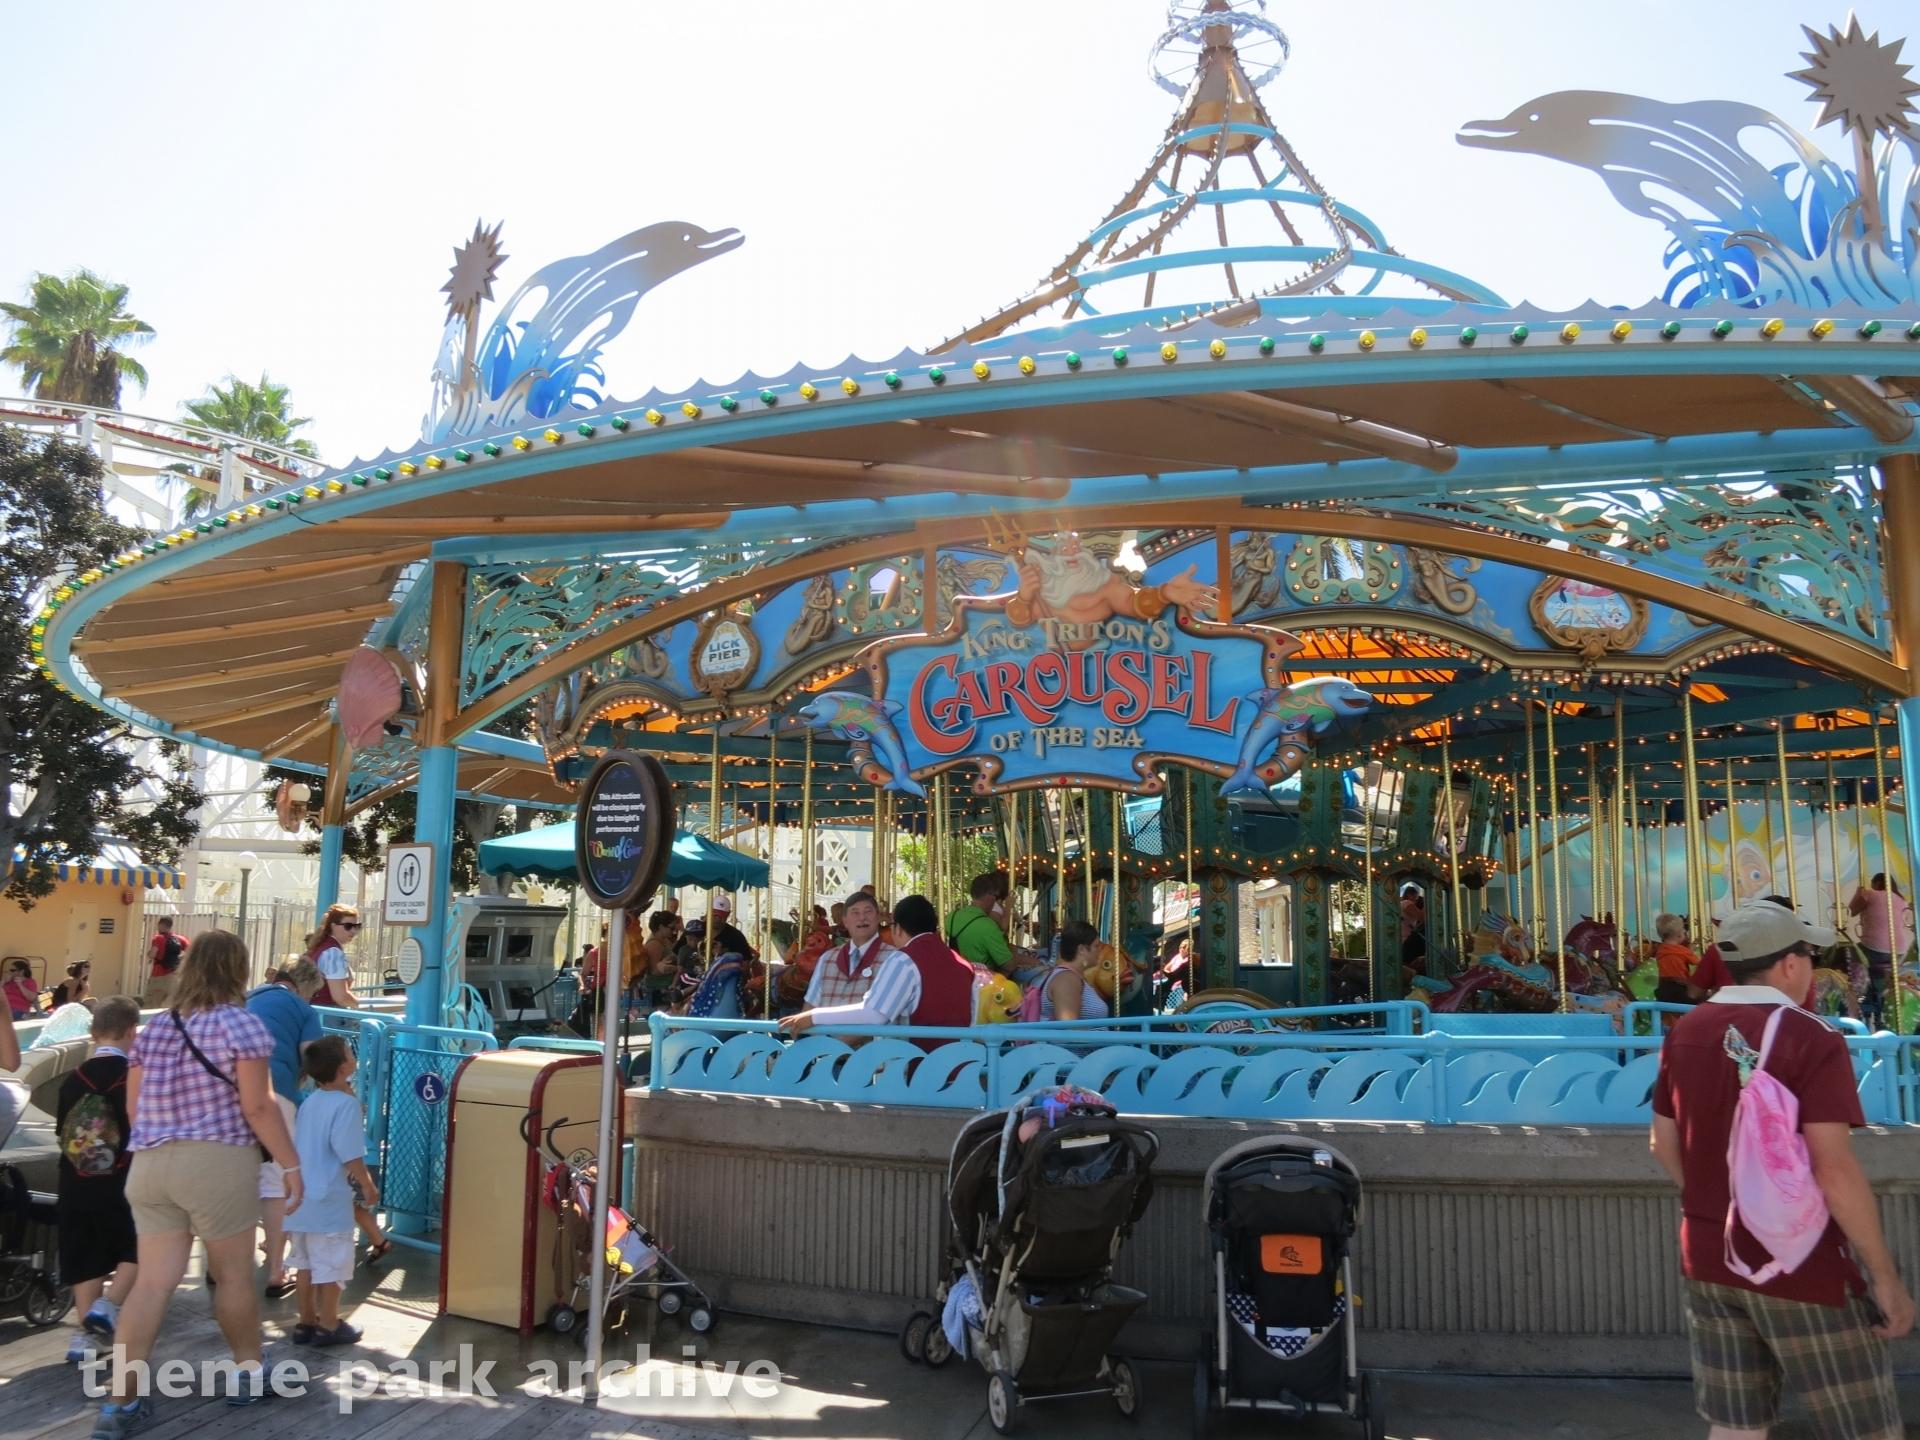 King Triton's Carousel of the Sea at Disney California Adventure